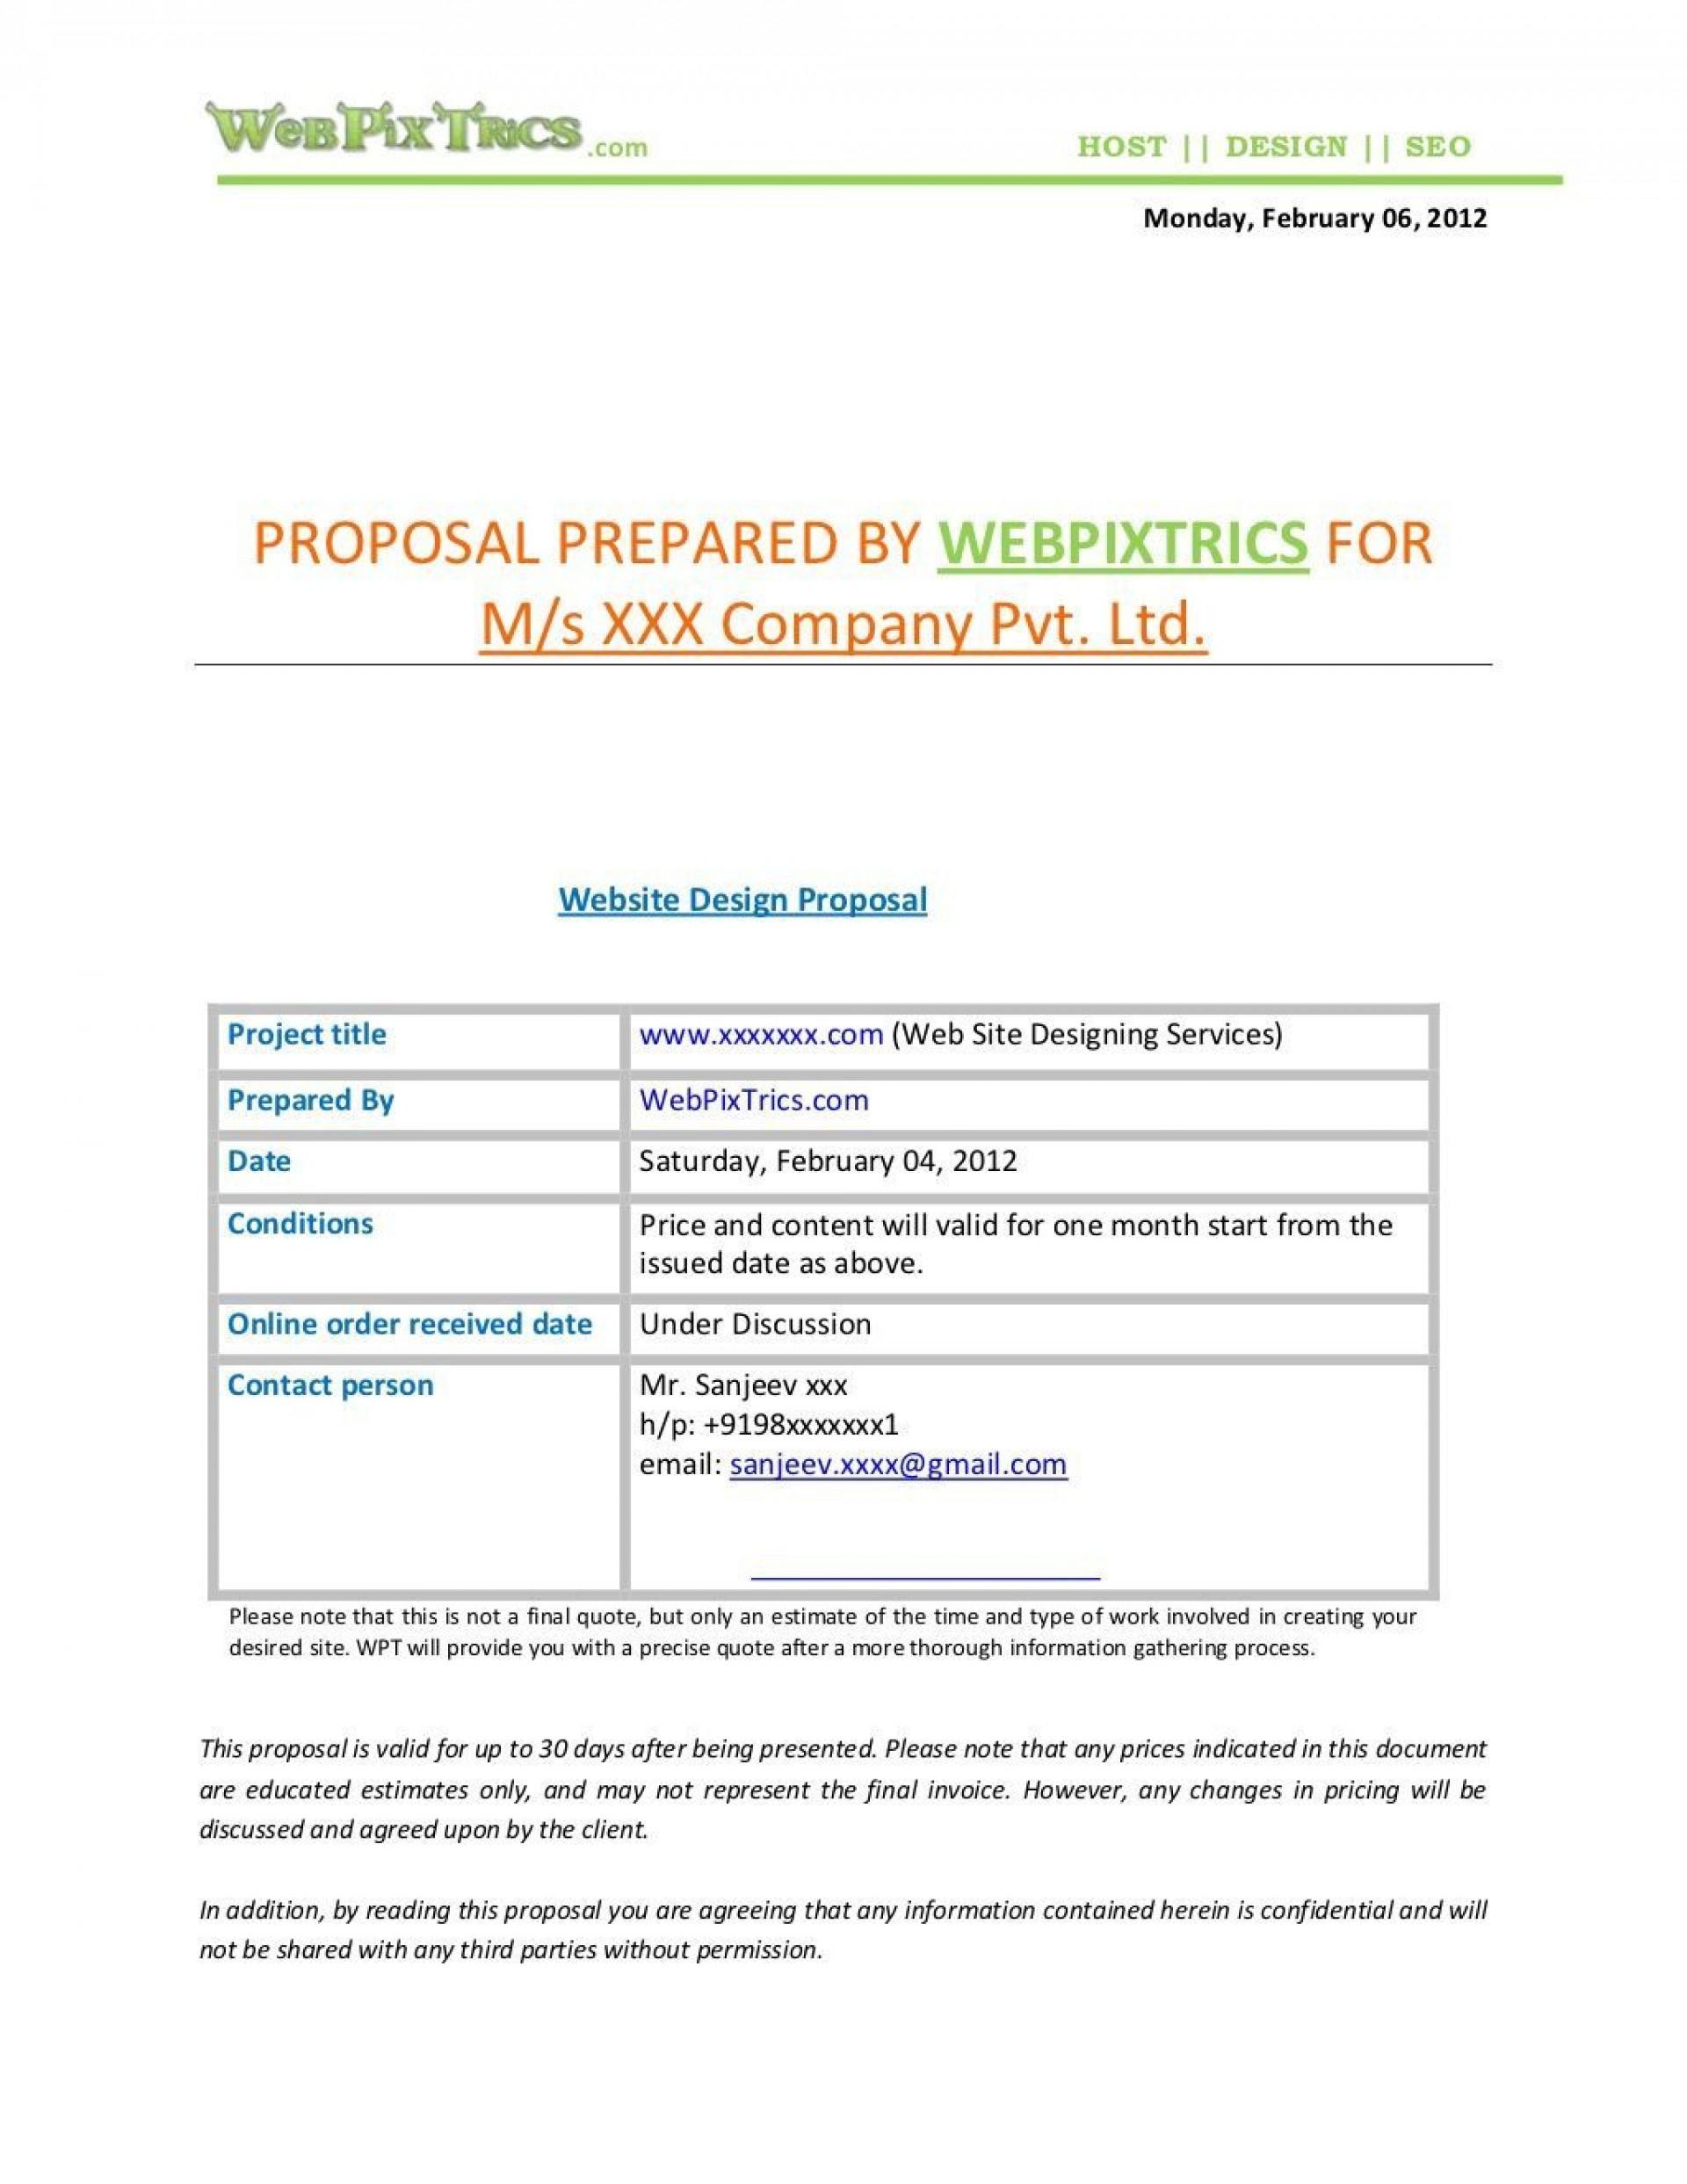 007 Stunning Web Design Proposal Template Free High Definition  Freelance Download1920